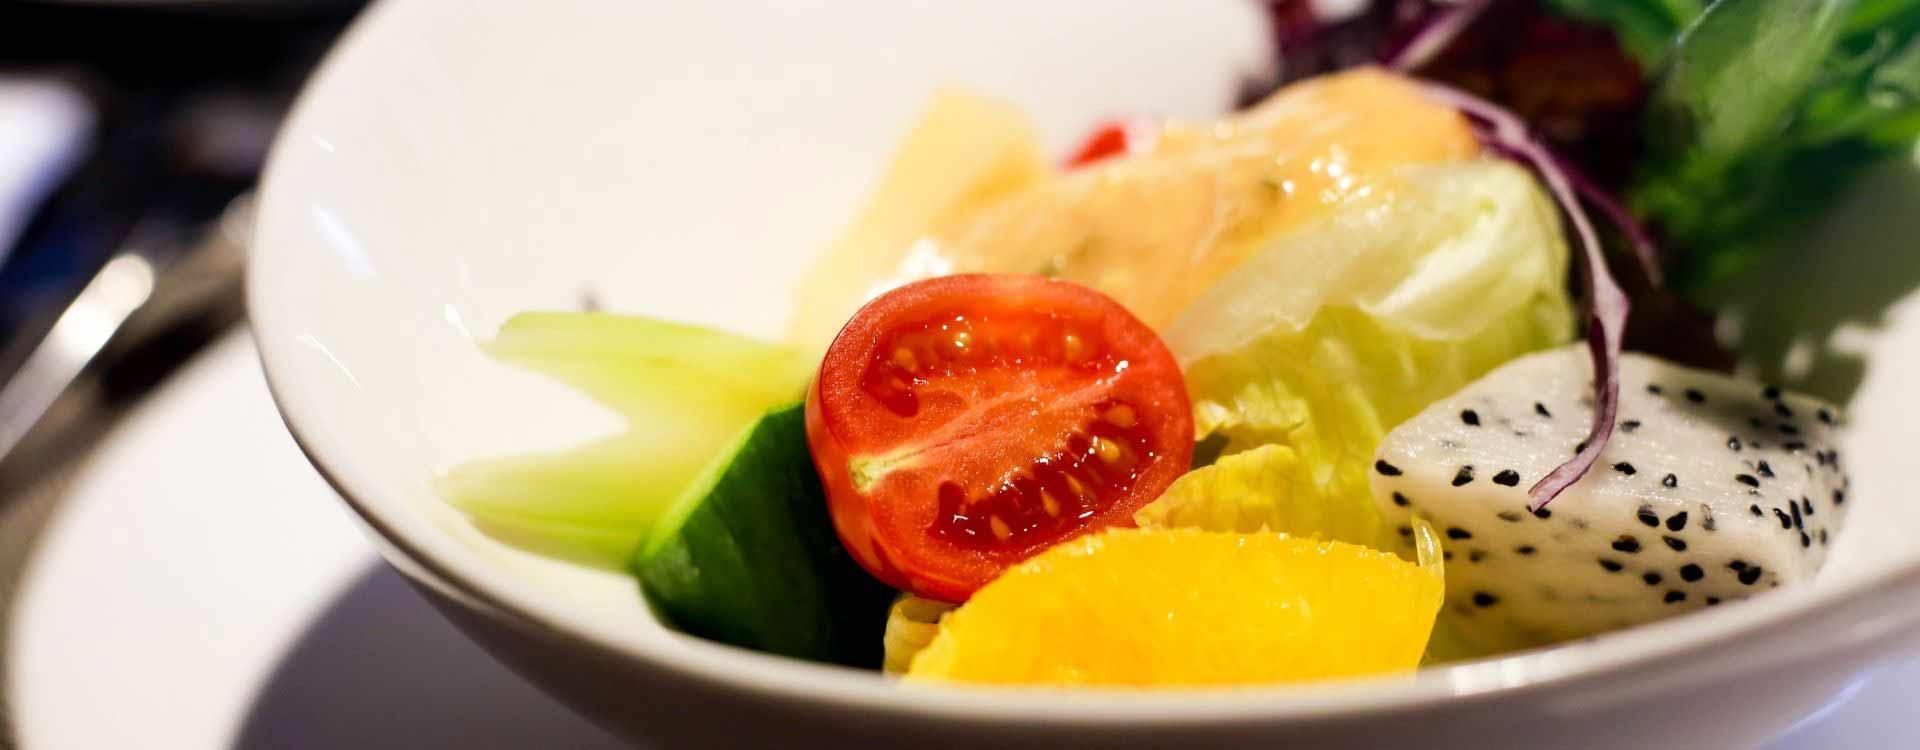 5 Everyday CBD Oil Recipes for Wellness and Health